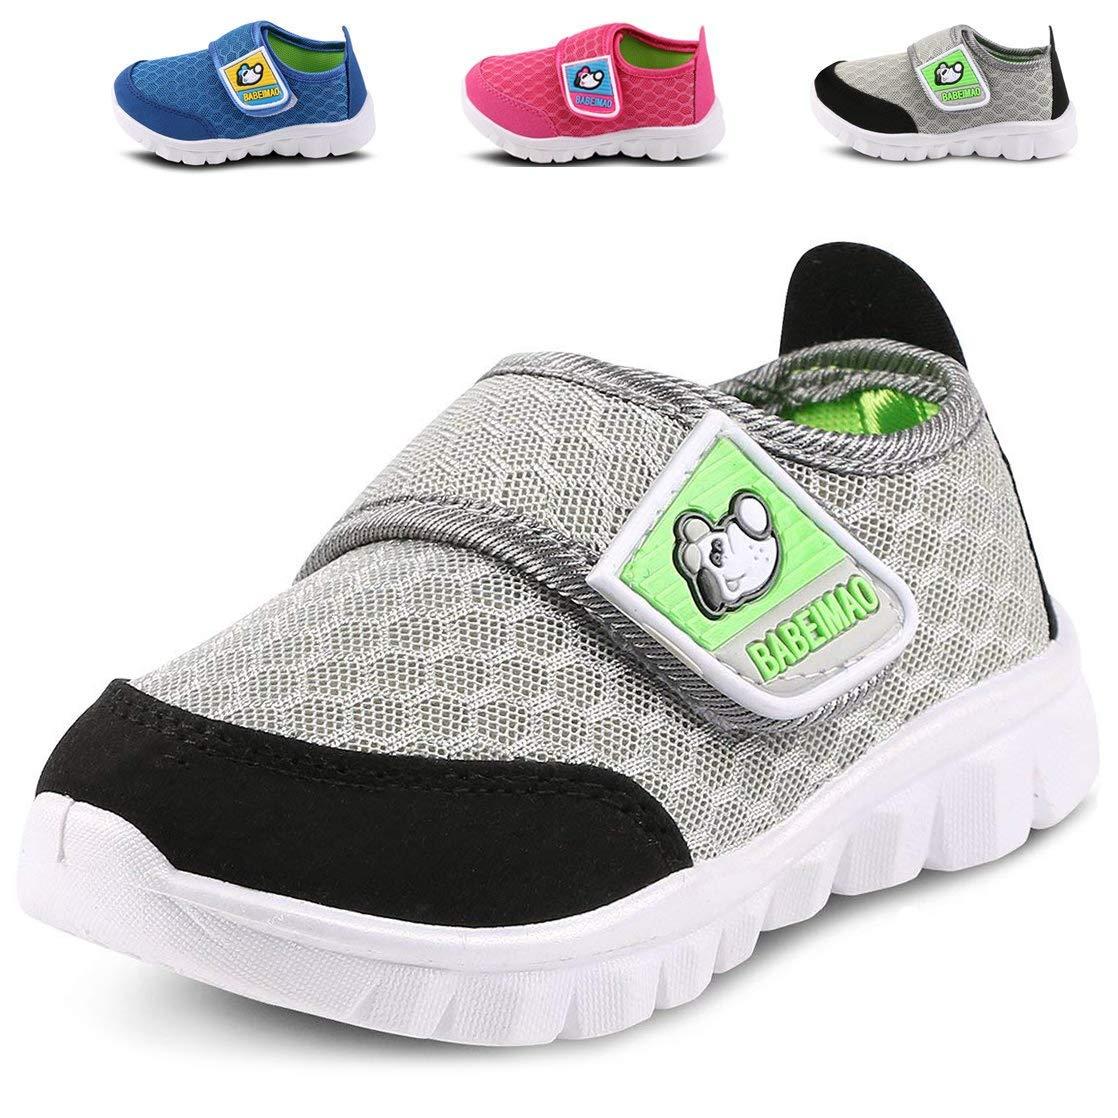 Femizee Toddler Boys Girls Lightweight Mesh Sneakers Kids Athletic Running Shoes